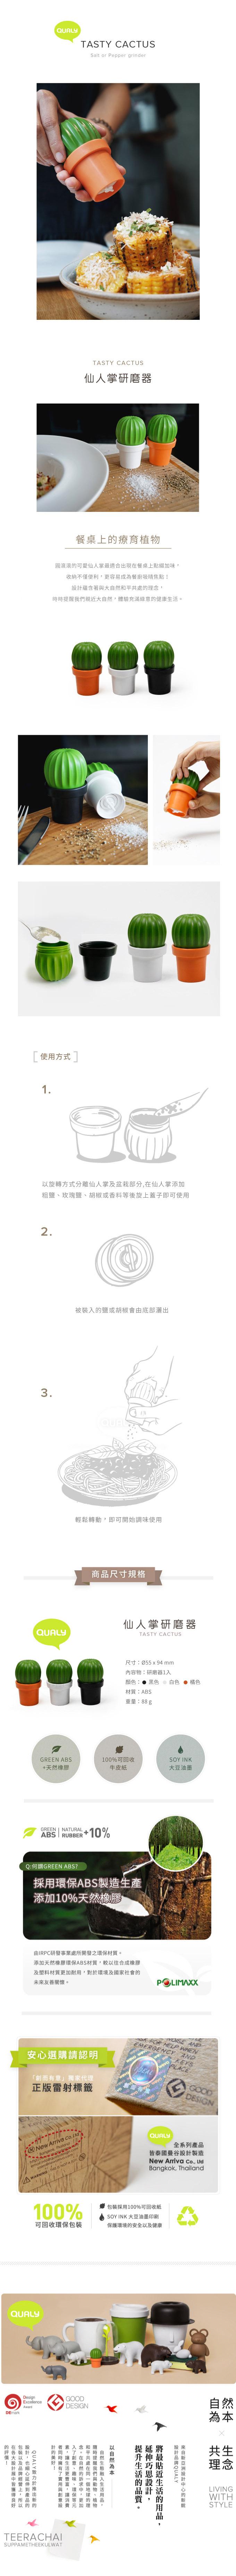 QUALY|仙人掌研磨器